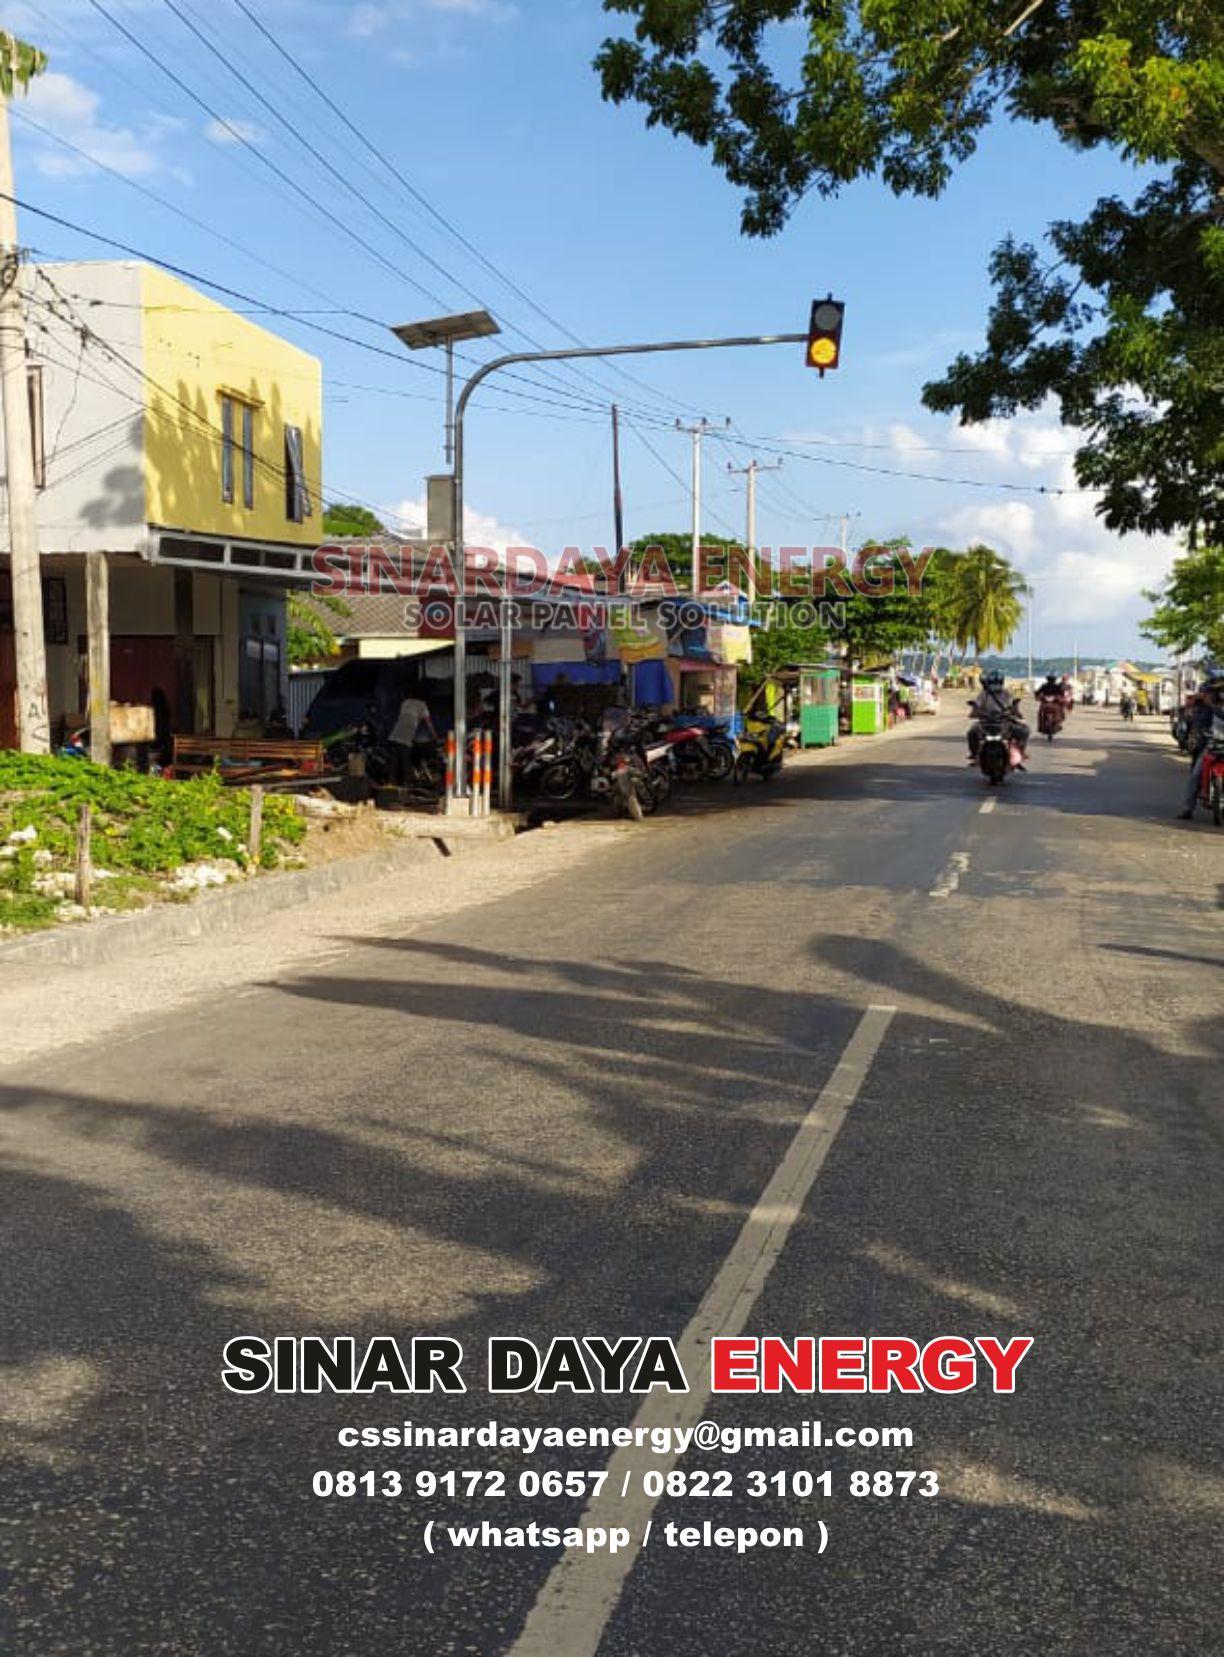 trafic light tenaga surya